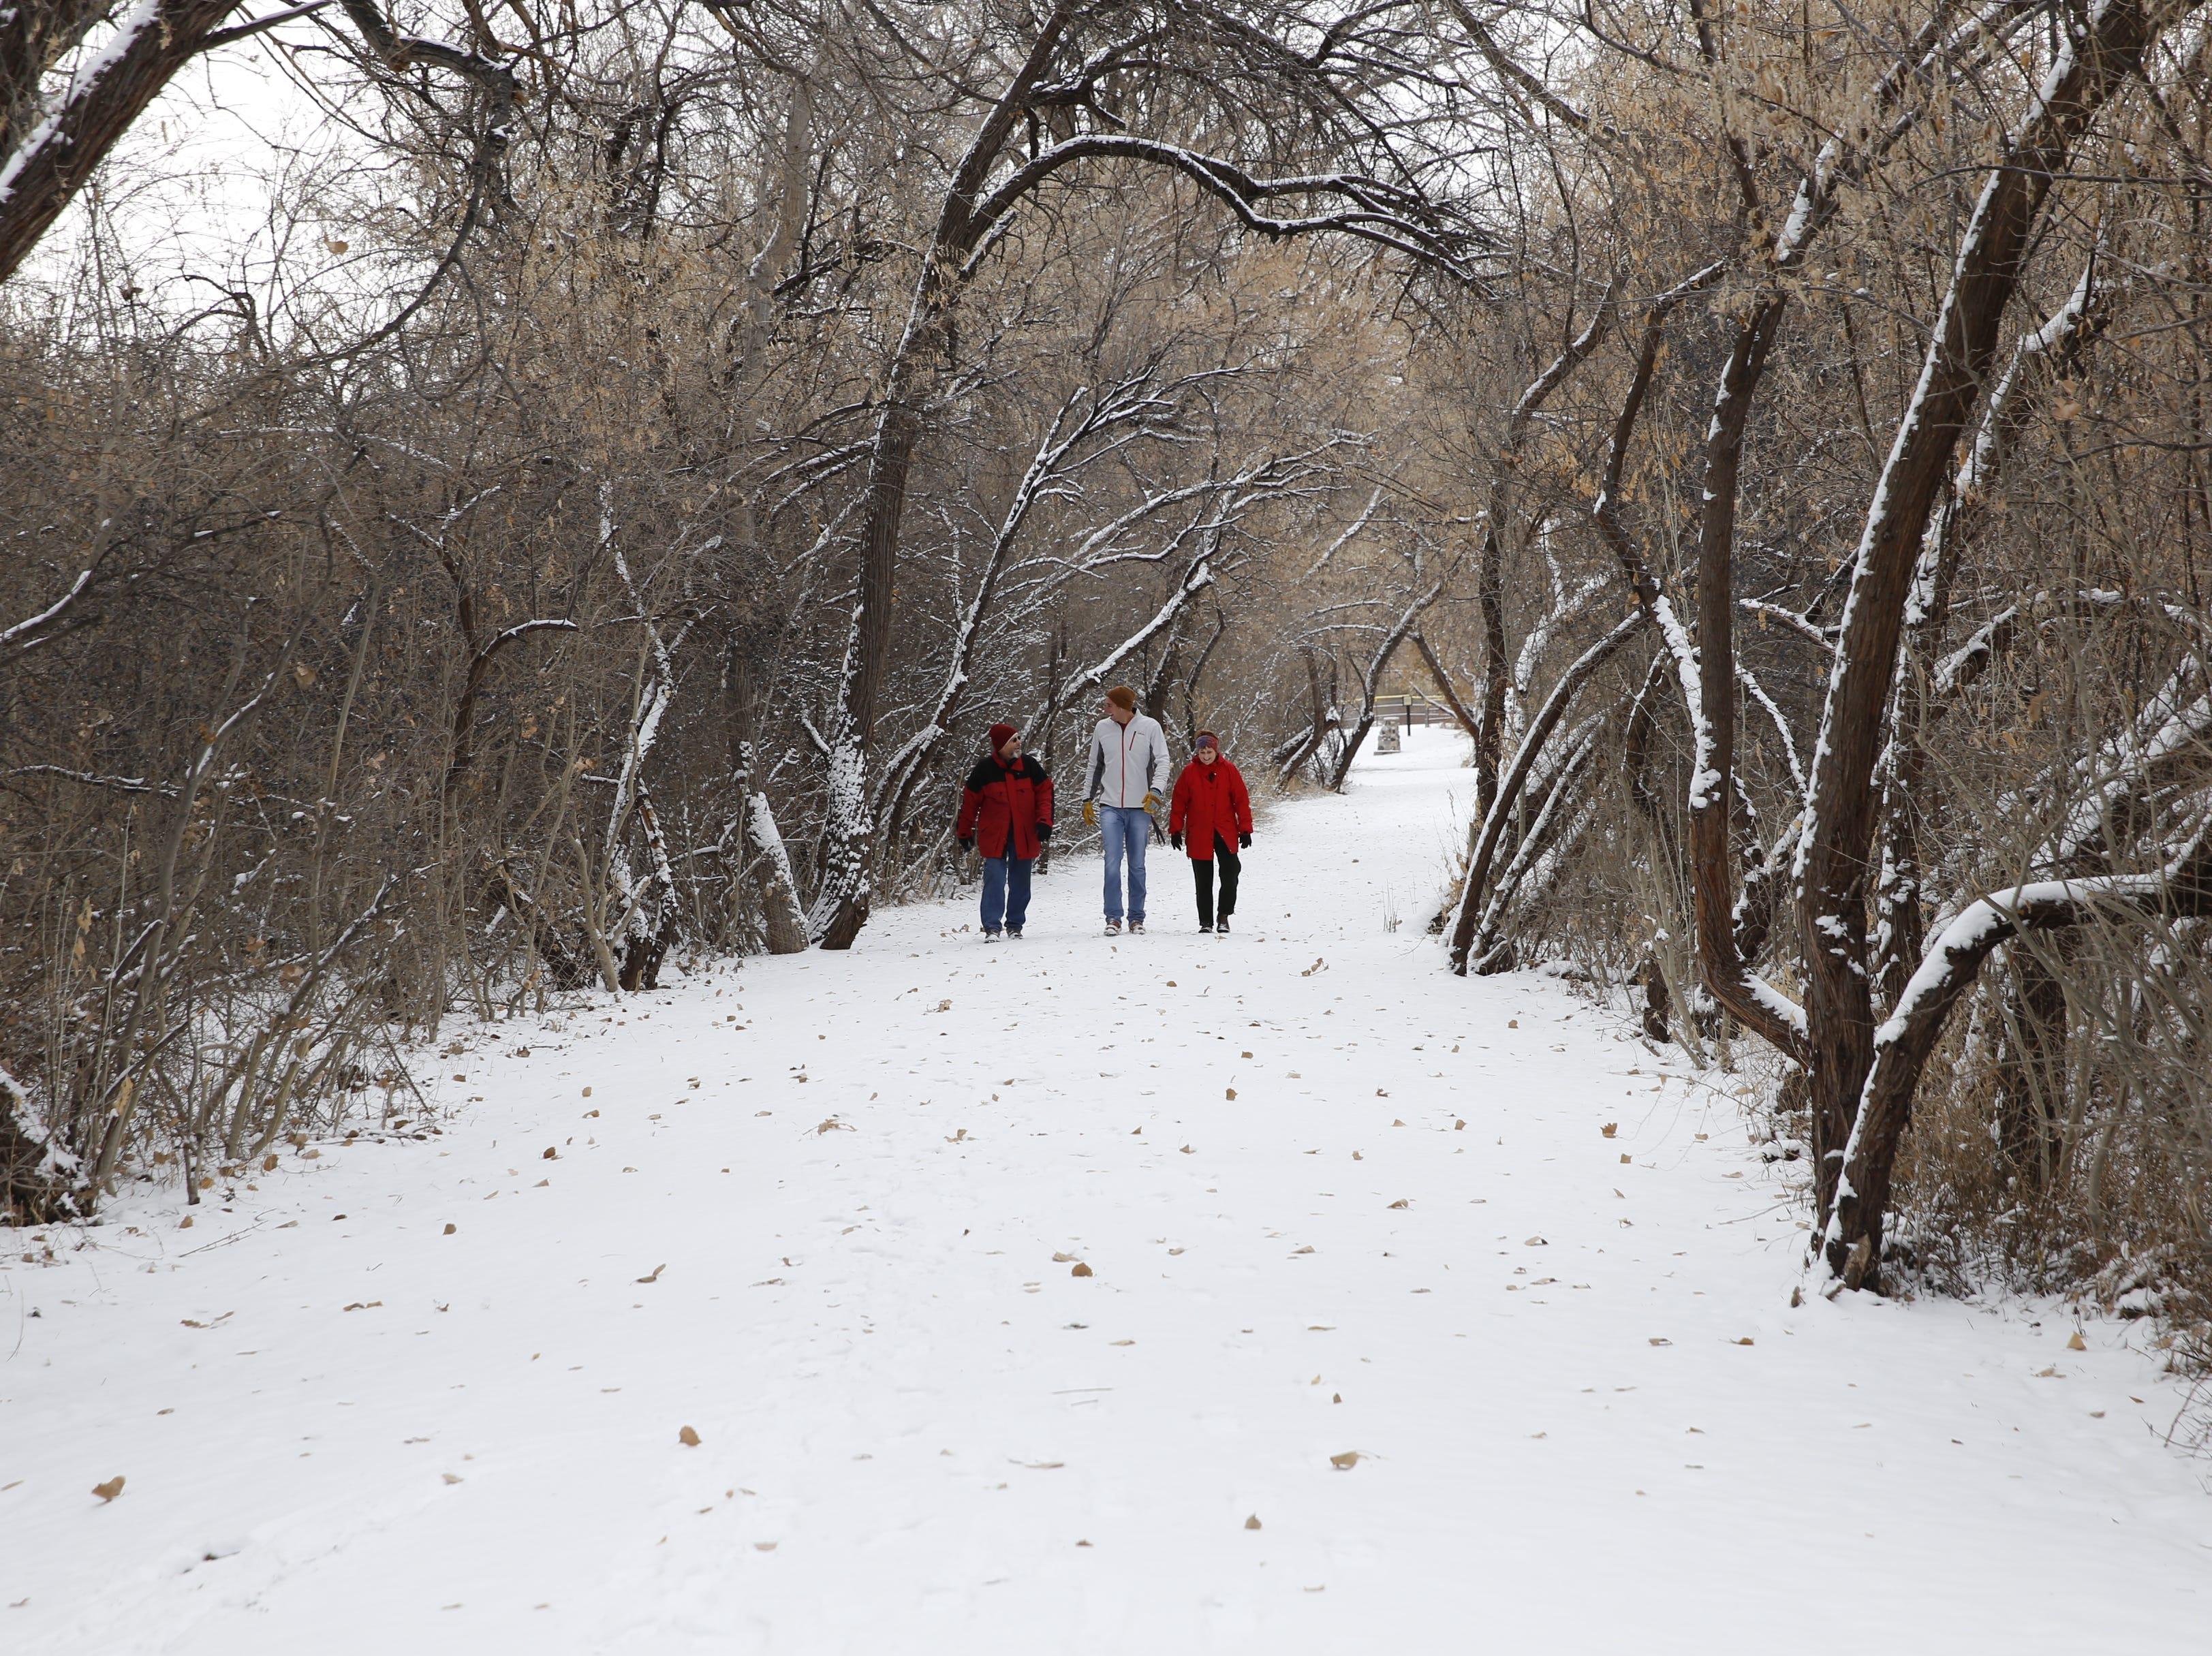 Randy McDowell, left, Connor McDowell and Teresa McDowell walk a trail on Friday in Animas Park in Farmington.